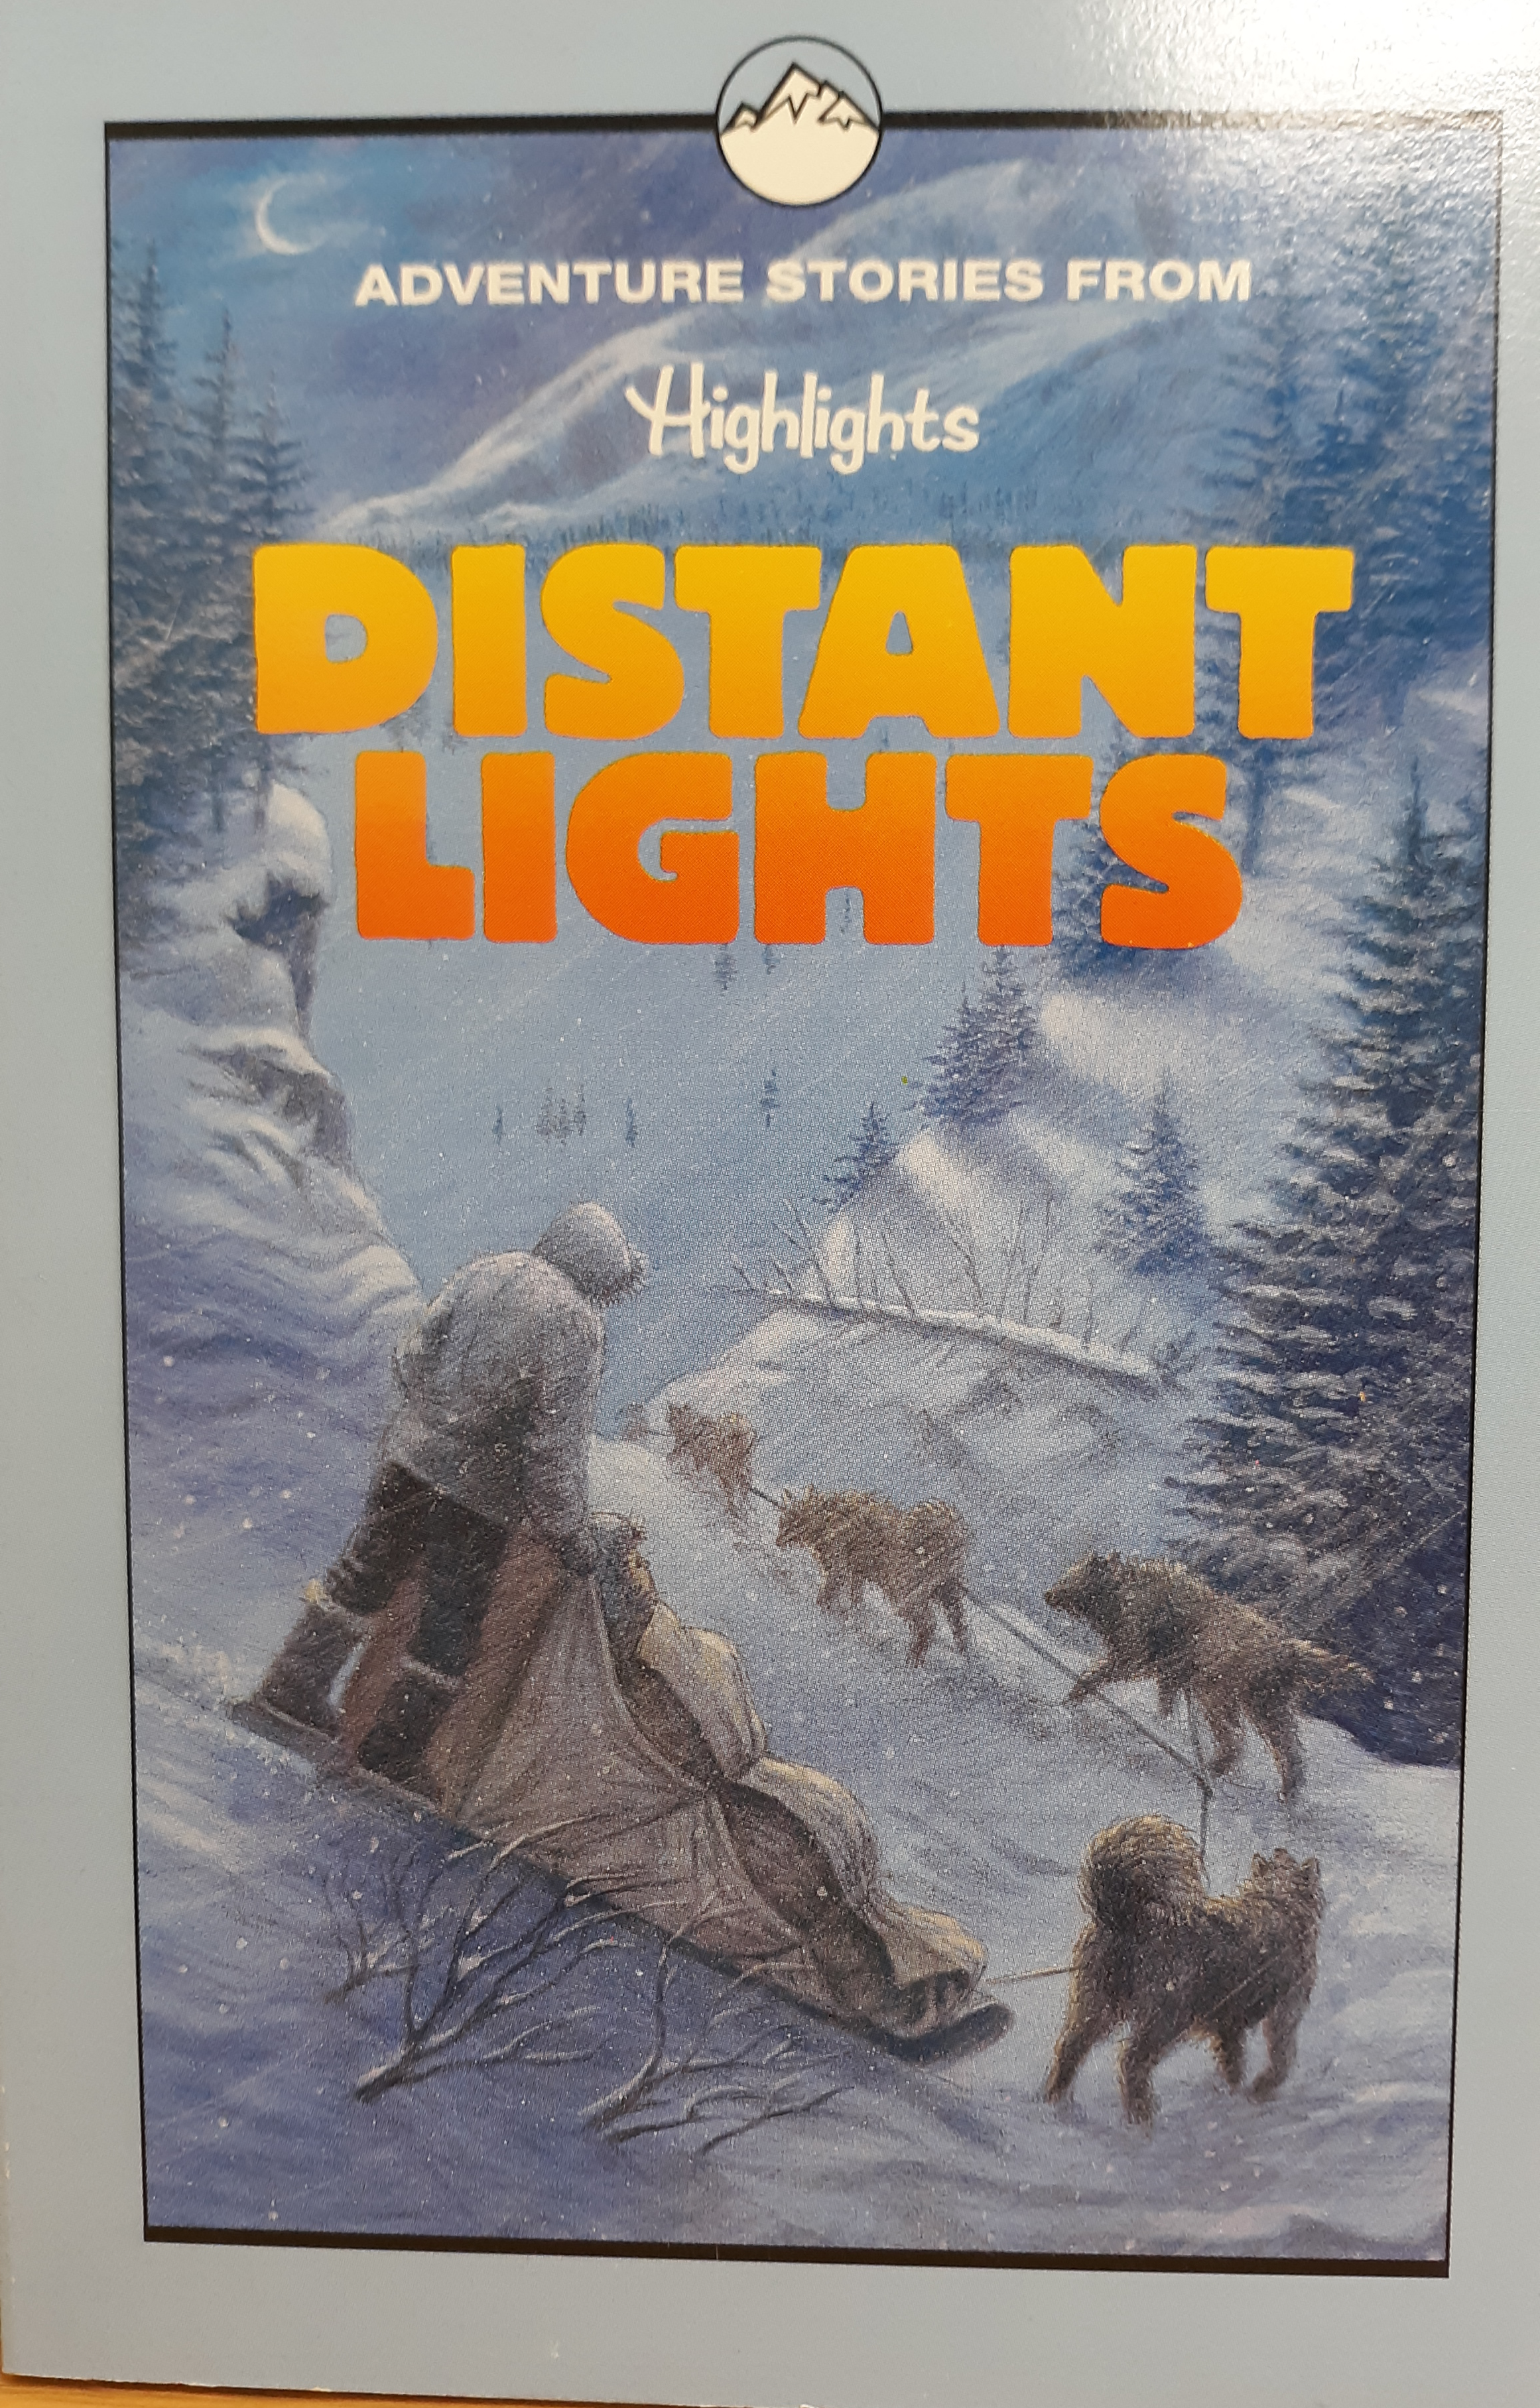 https://0201.nccdn.net/1_2/000/000/115/dda/distant-lights.png